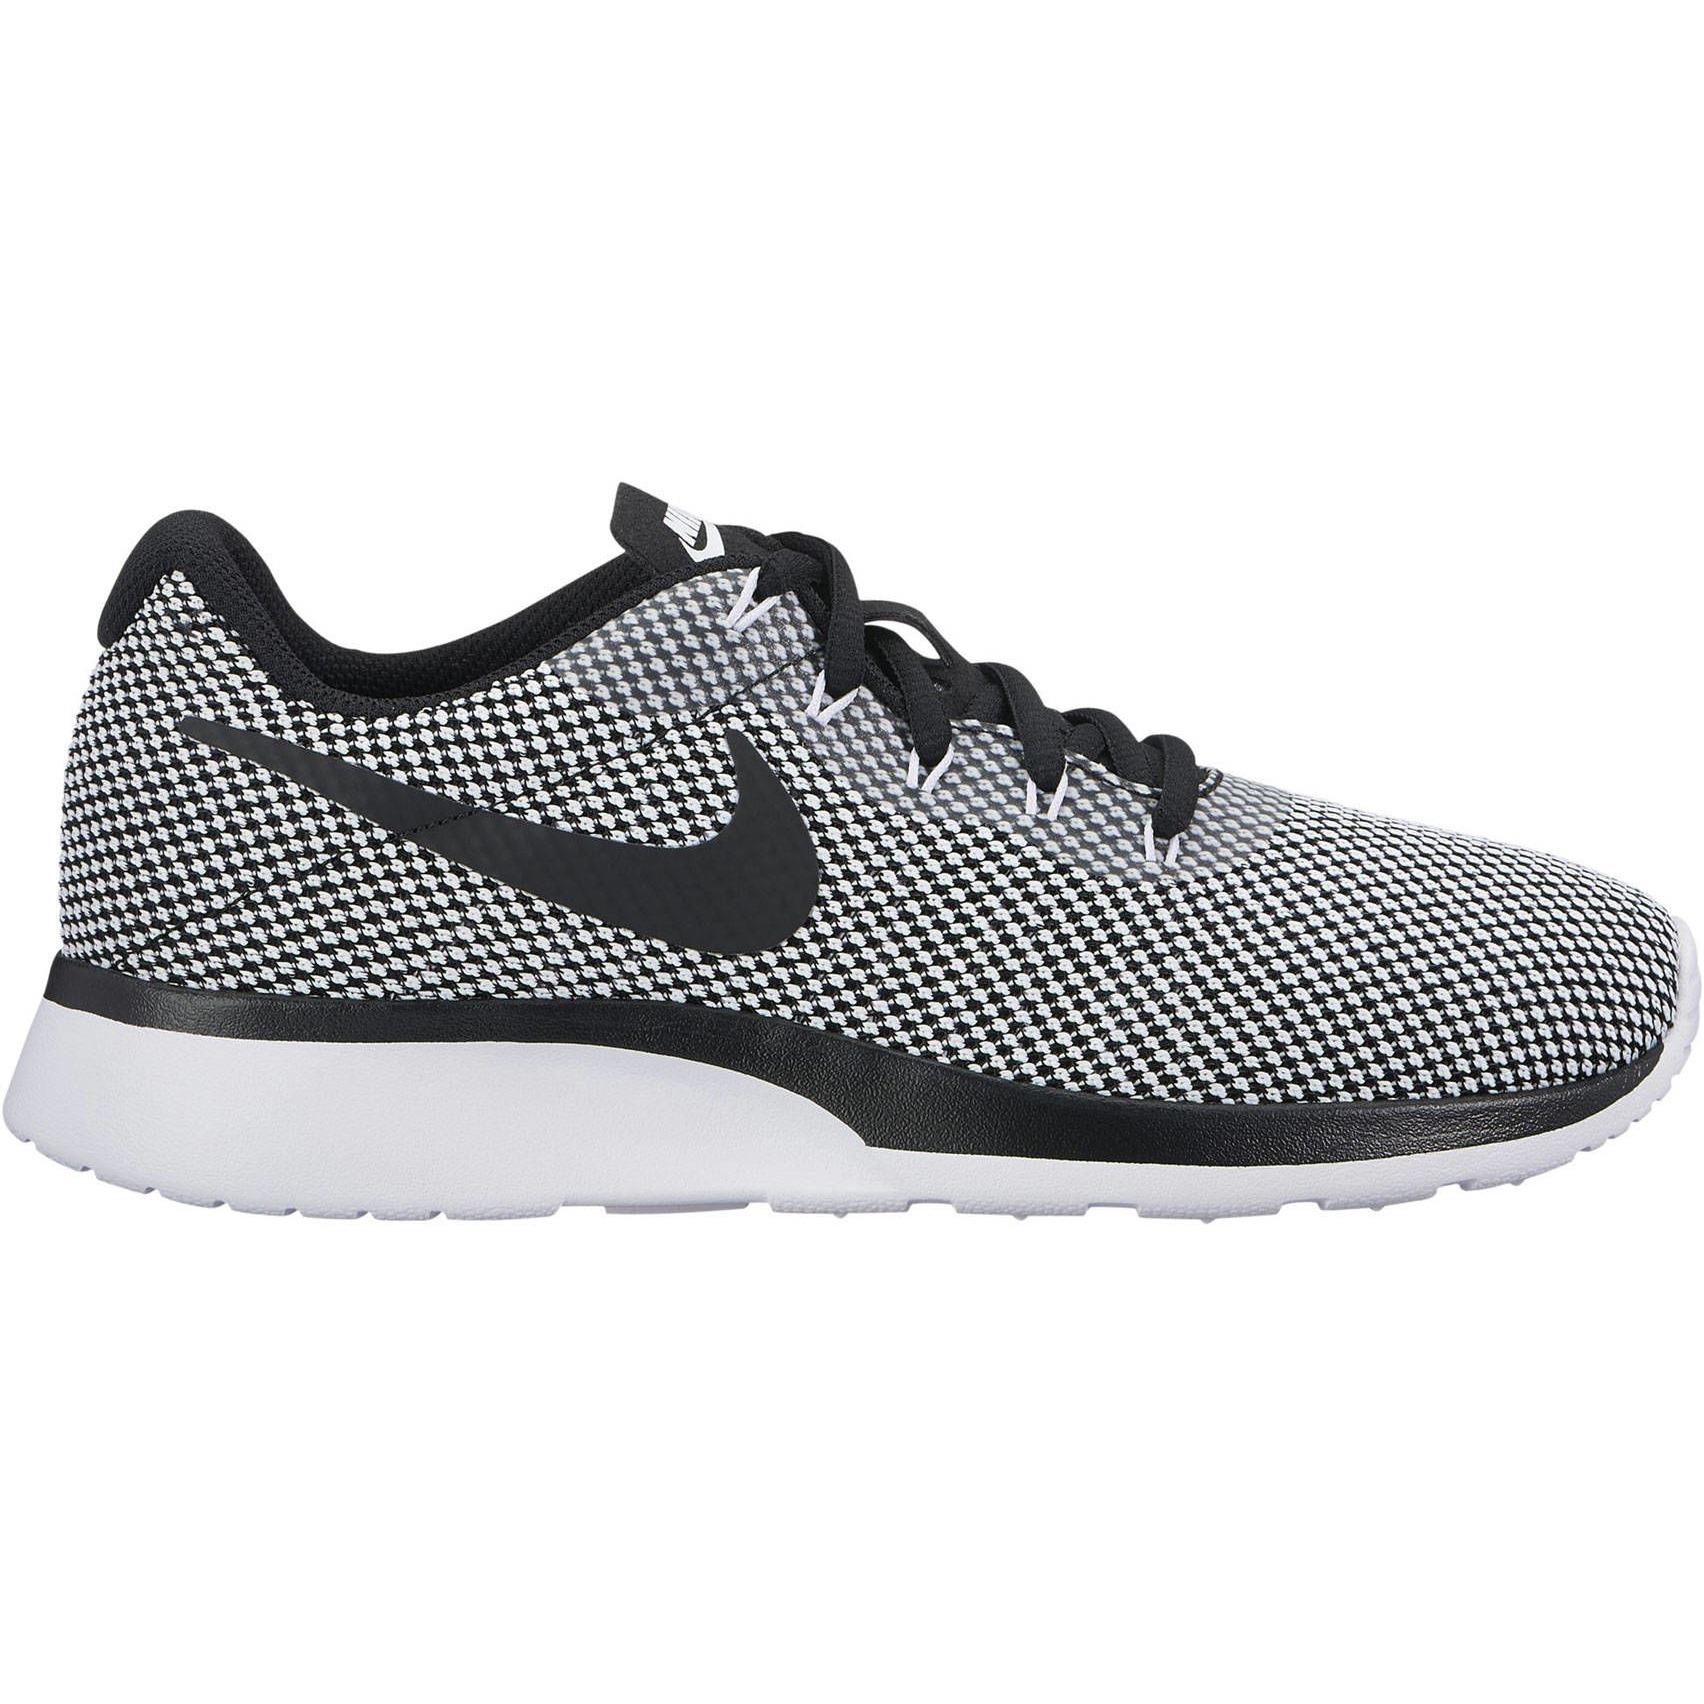 1cf64c31a2f69 Nike WMNS Tanjun Racer Damen Freizeitschuhe Women Schuhe Freizeitschuhe